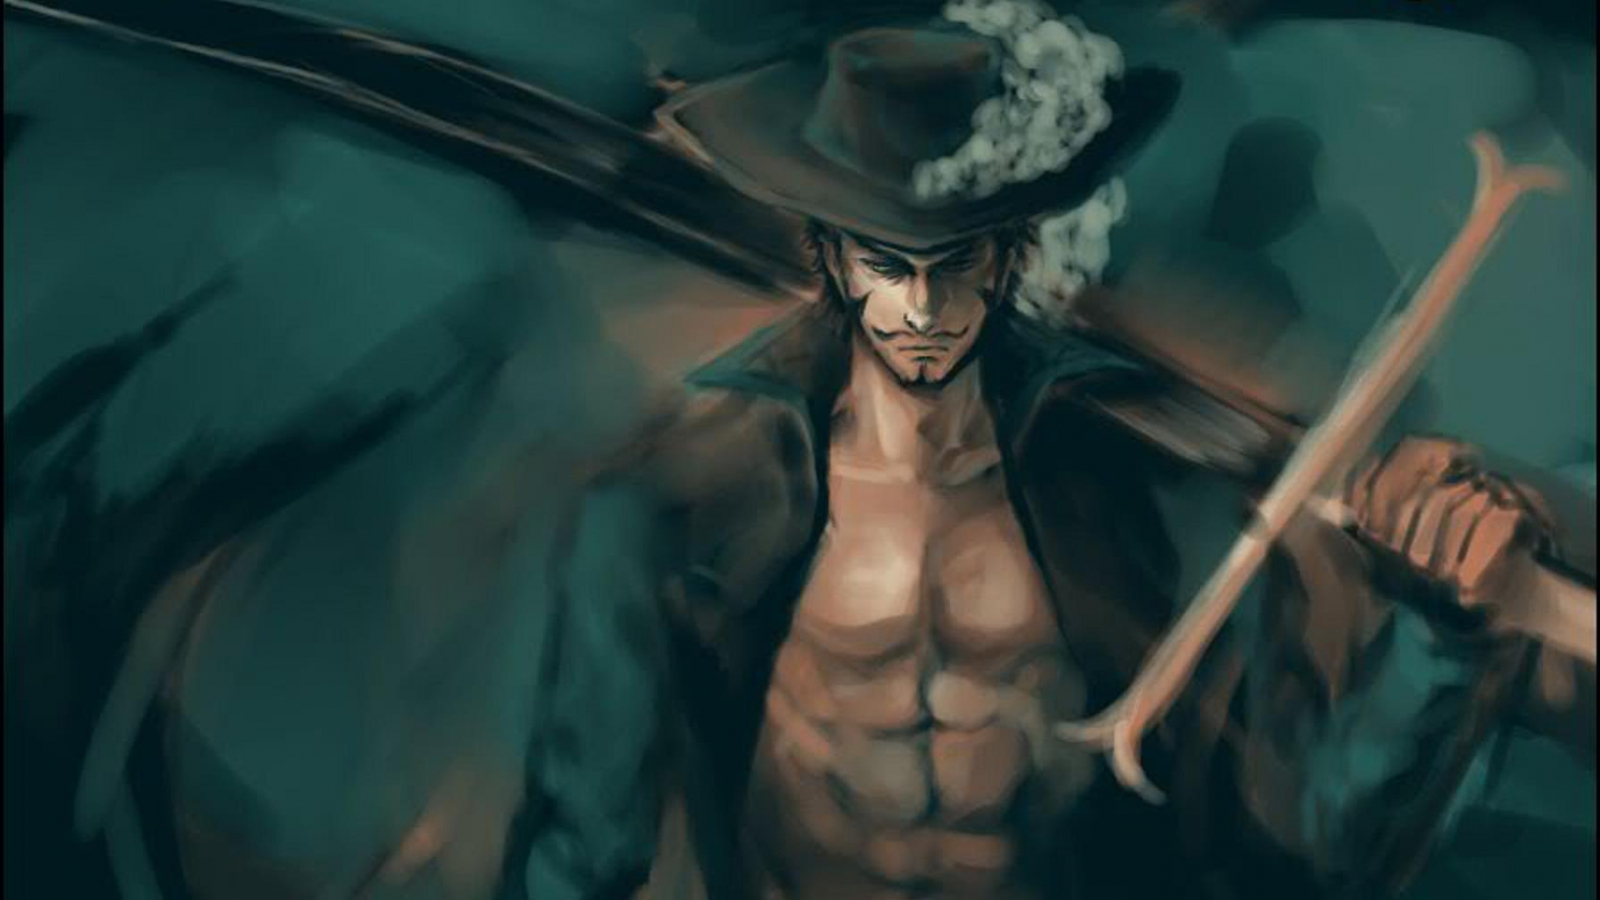 Dracule Mihawk | Your daily Anime Wallpaper and Fan Art